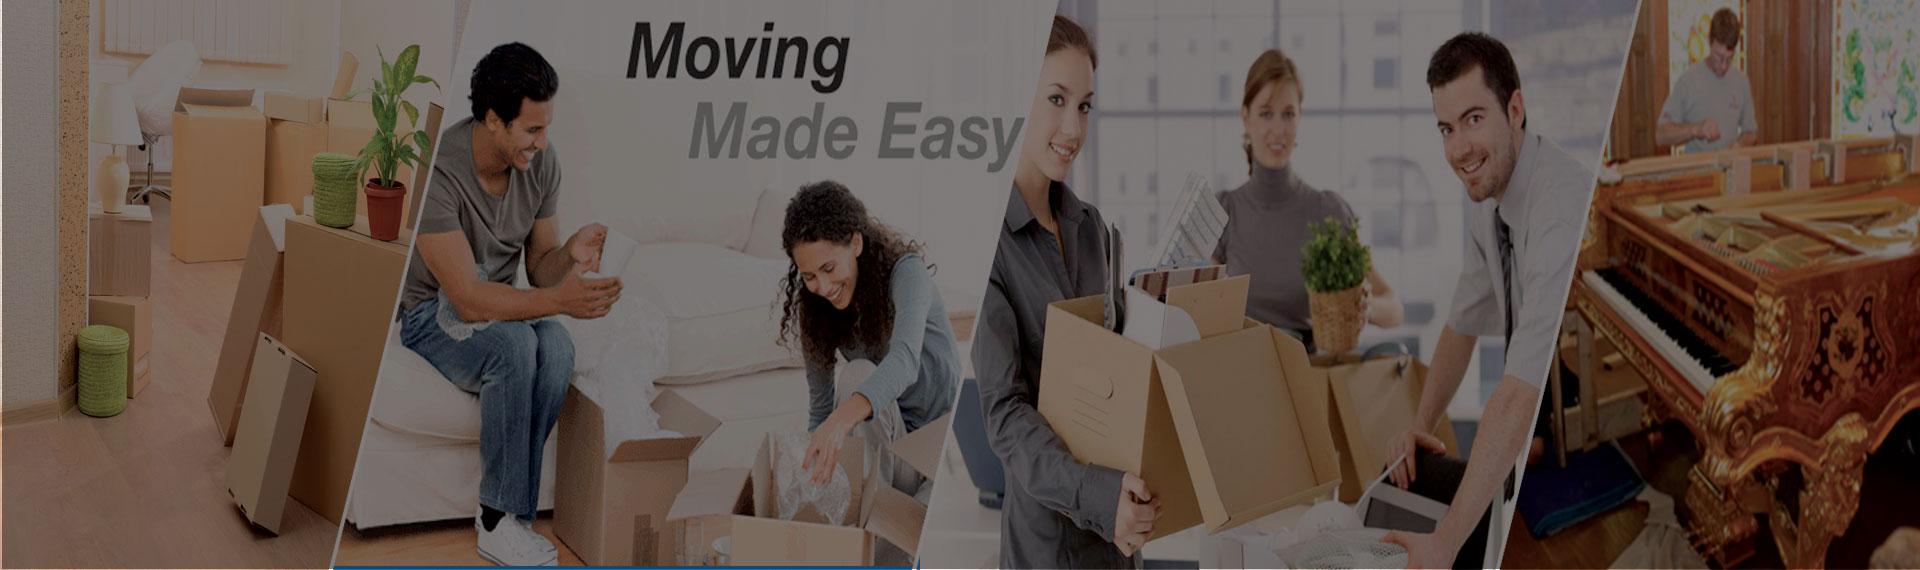 JV Moving Corp Virginia VA